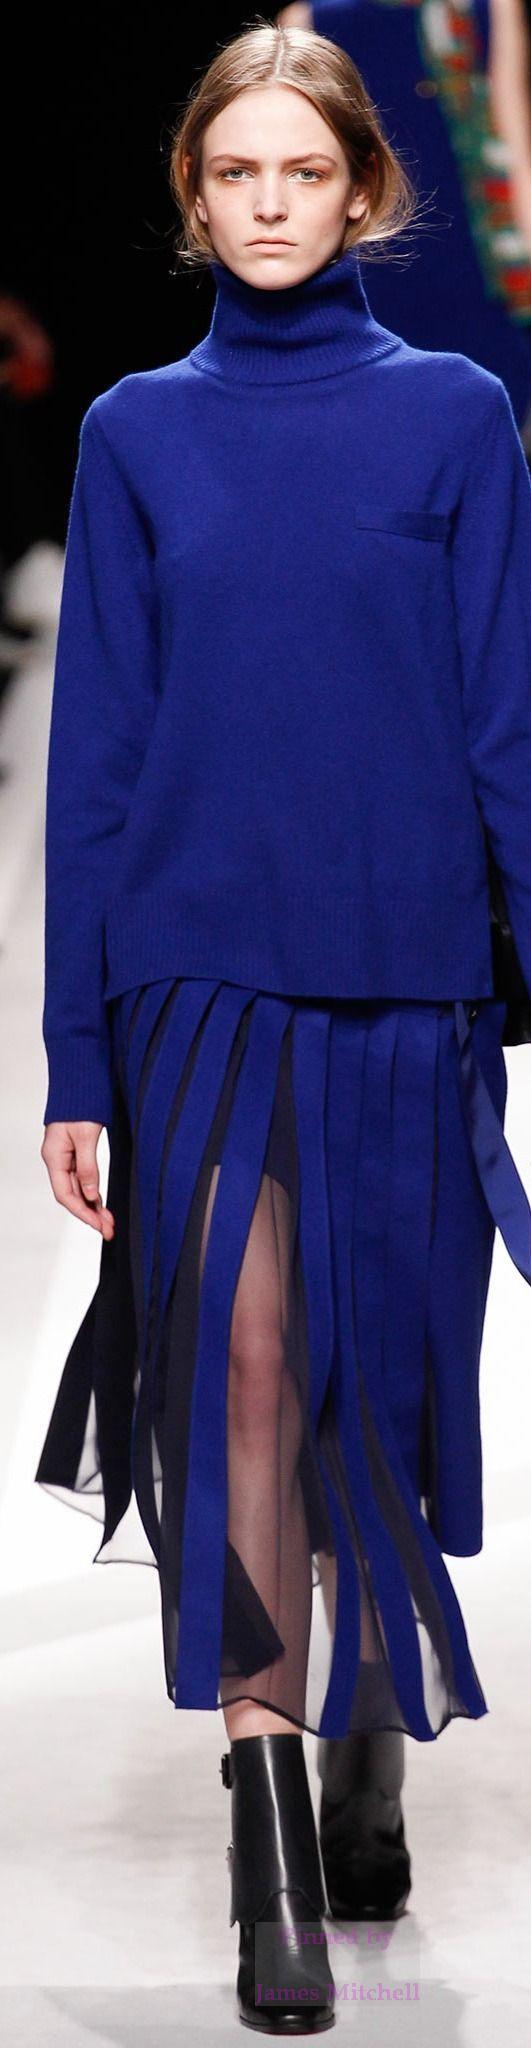 Sacai Collection Fall 2014 Ready to Wear Classic Blue #FusionbeadsColoroftheMonth #Pantone: